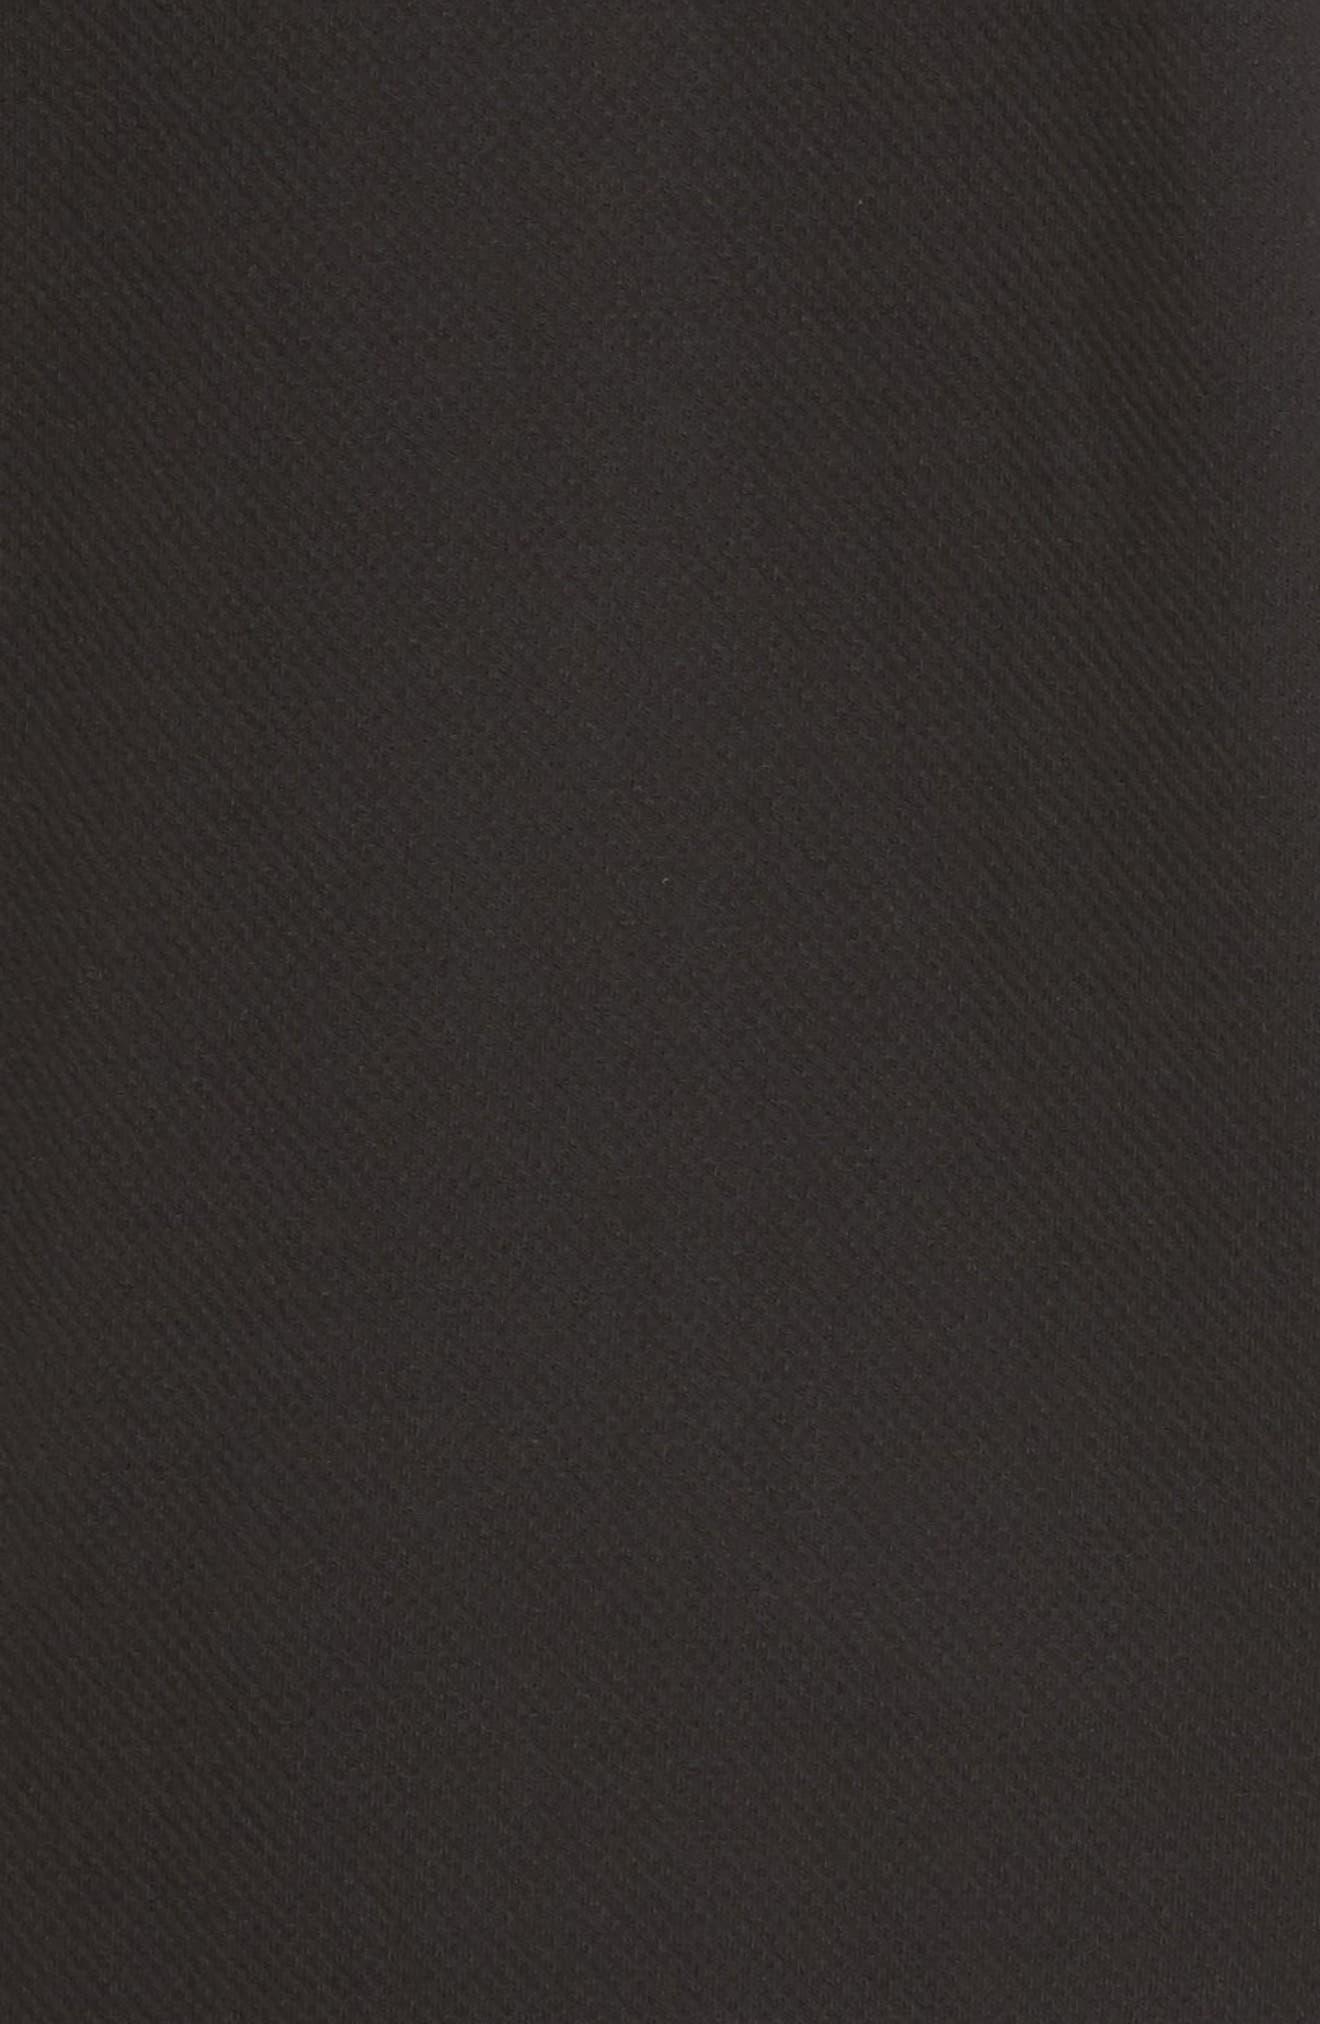 Zip Fleece Bomber Jacket,                             Alternate thumbnail 5, color,                             001